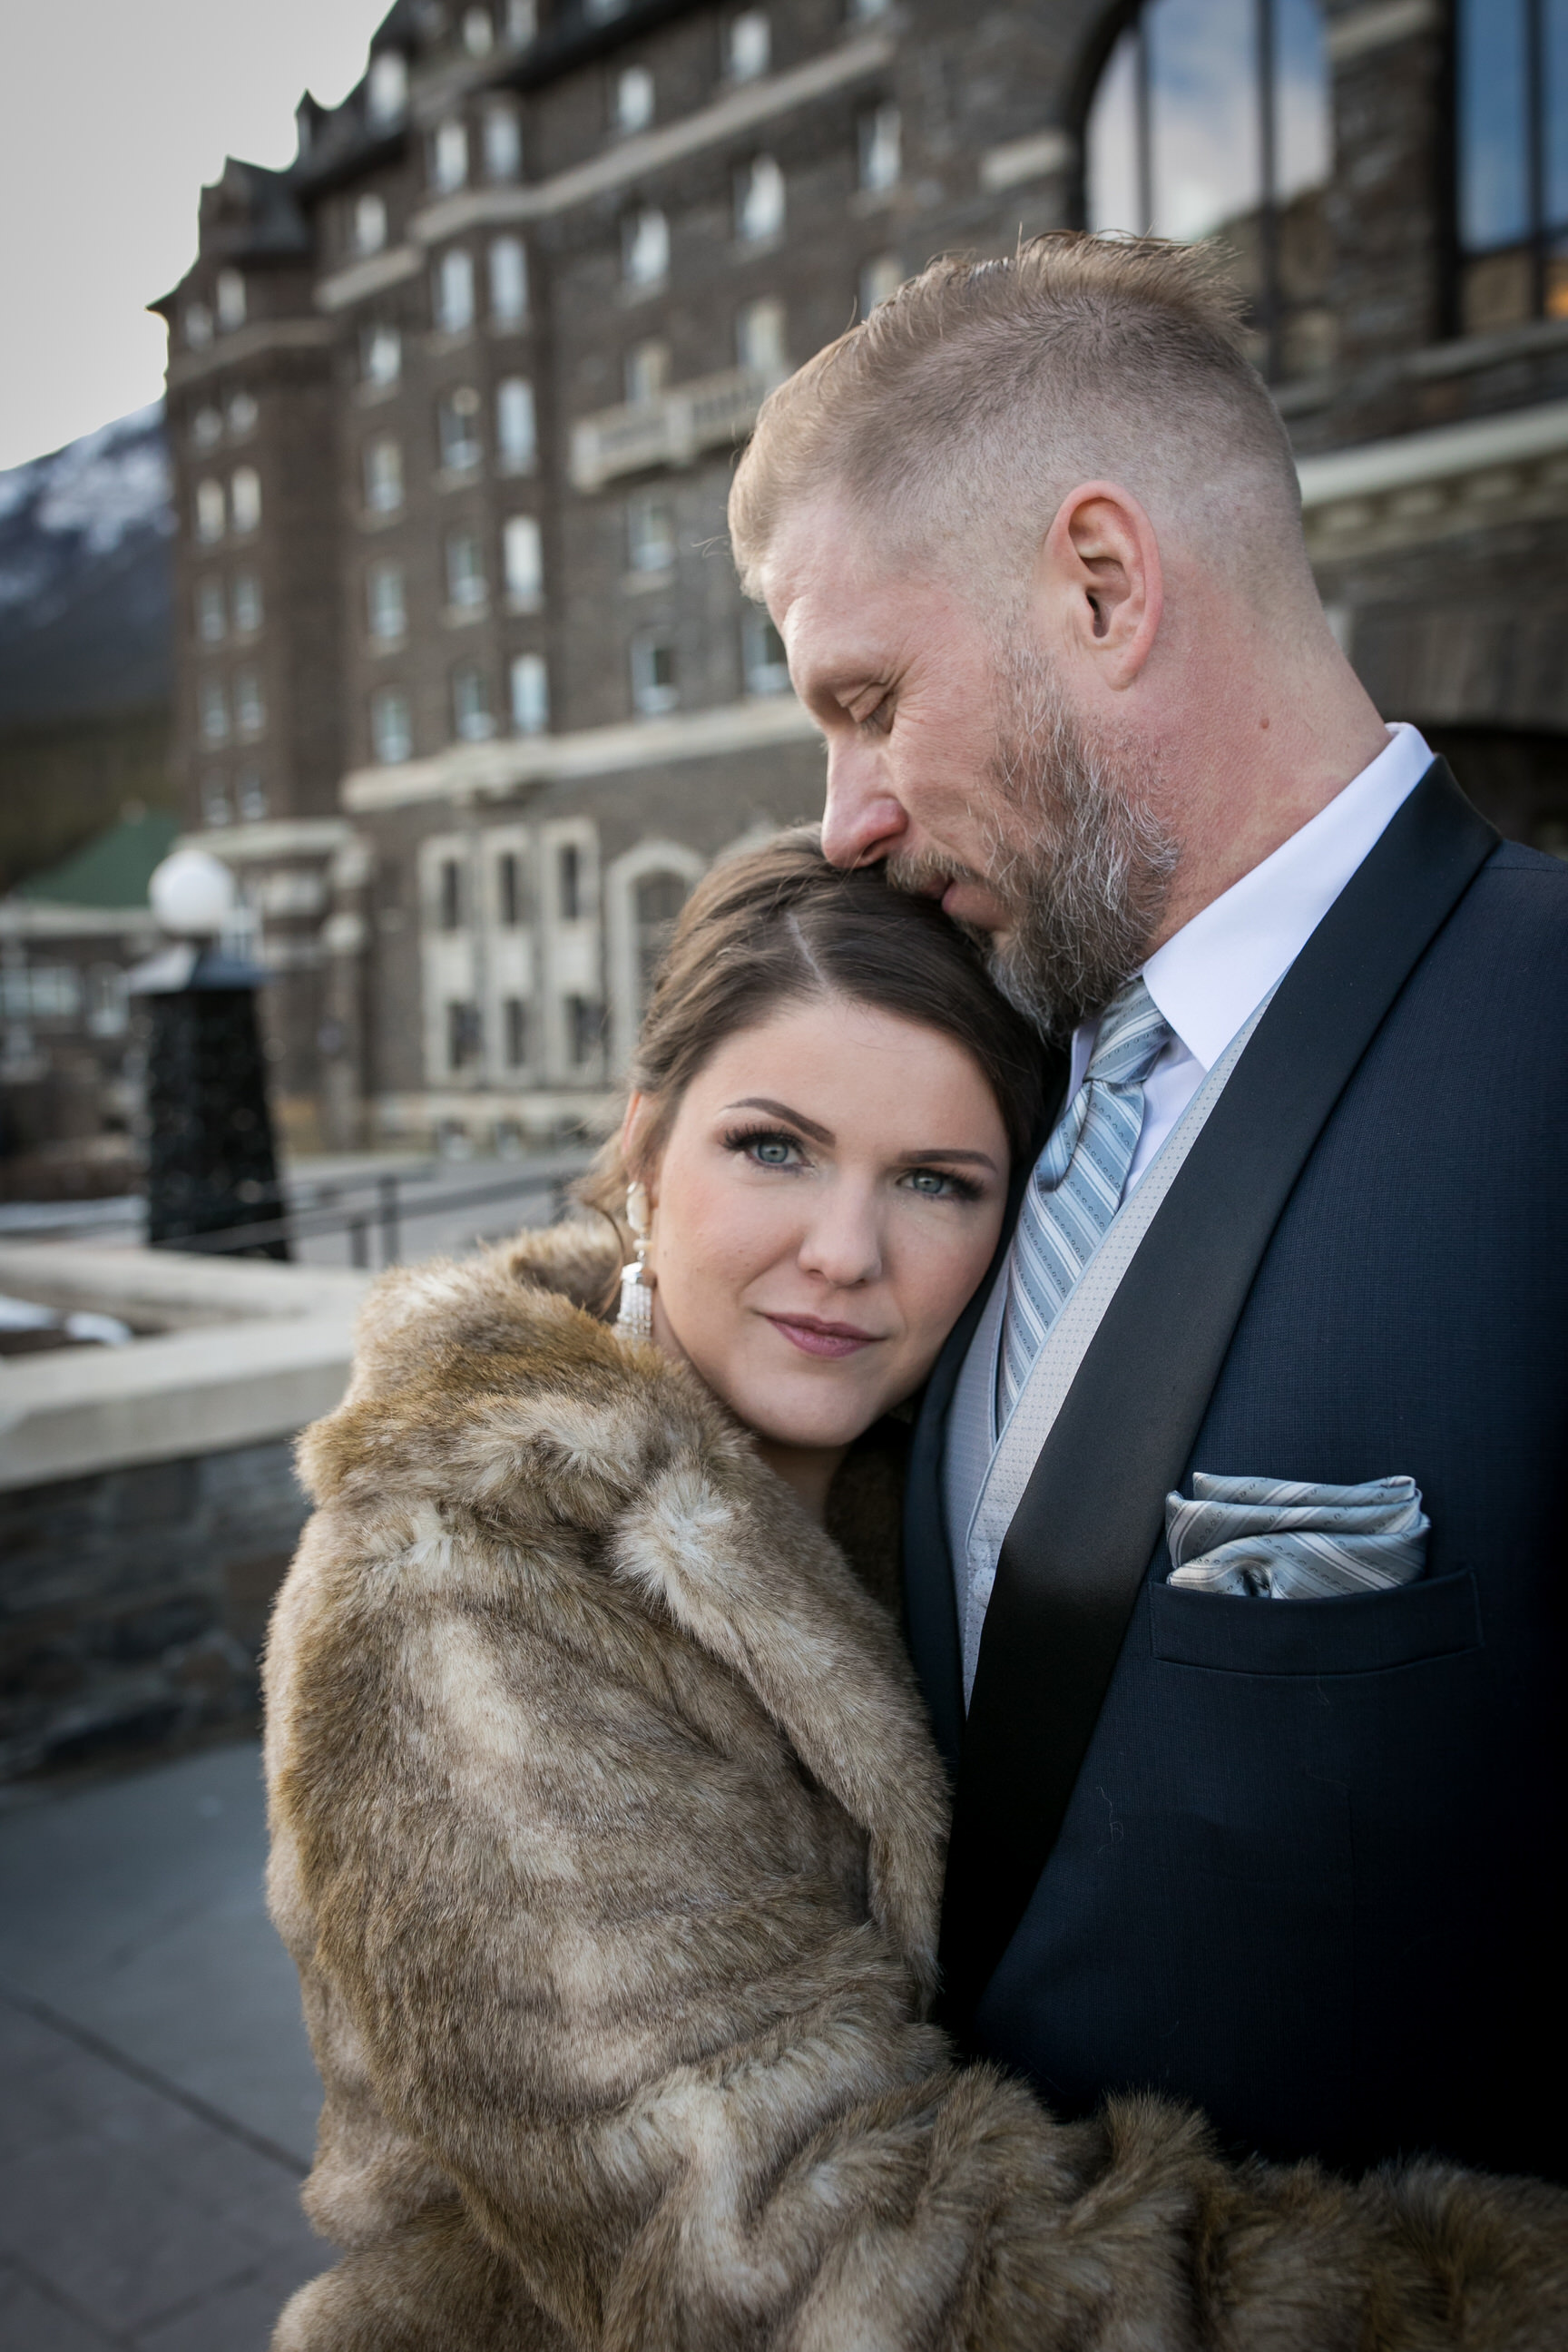 Fairmont Banff Springs Hotel Wedding Photos in the courtyard